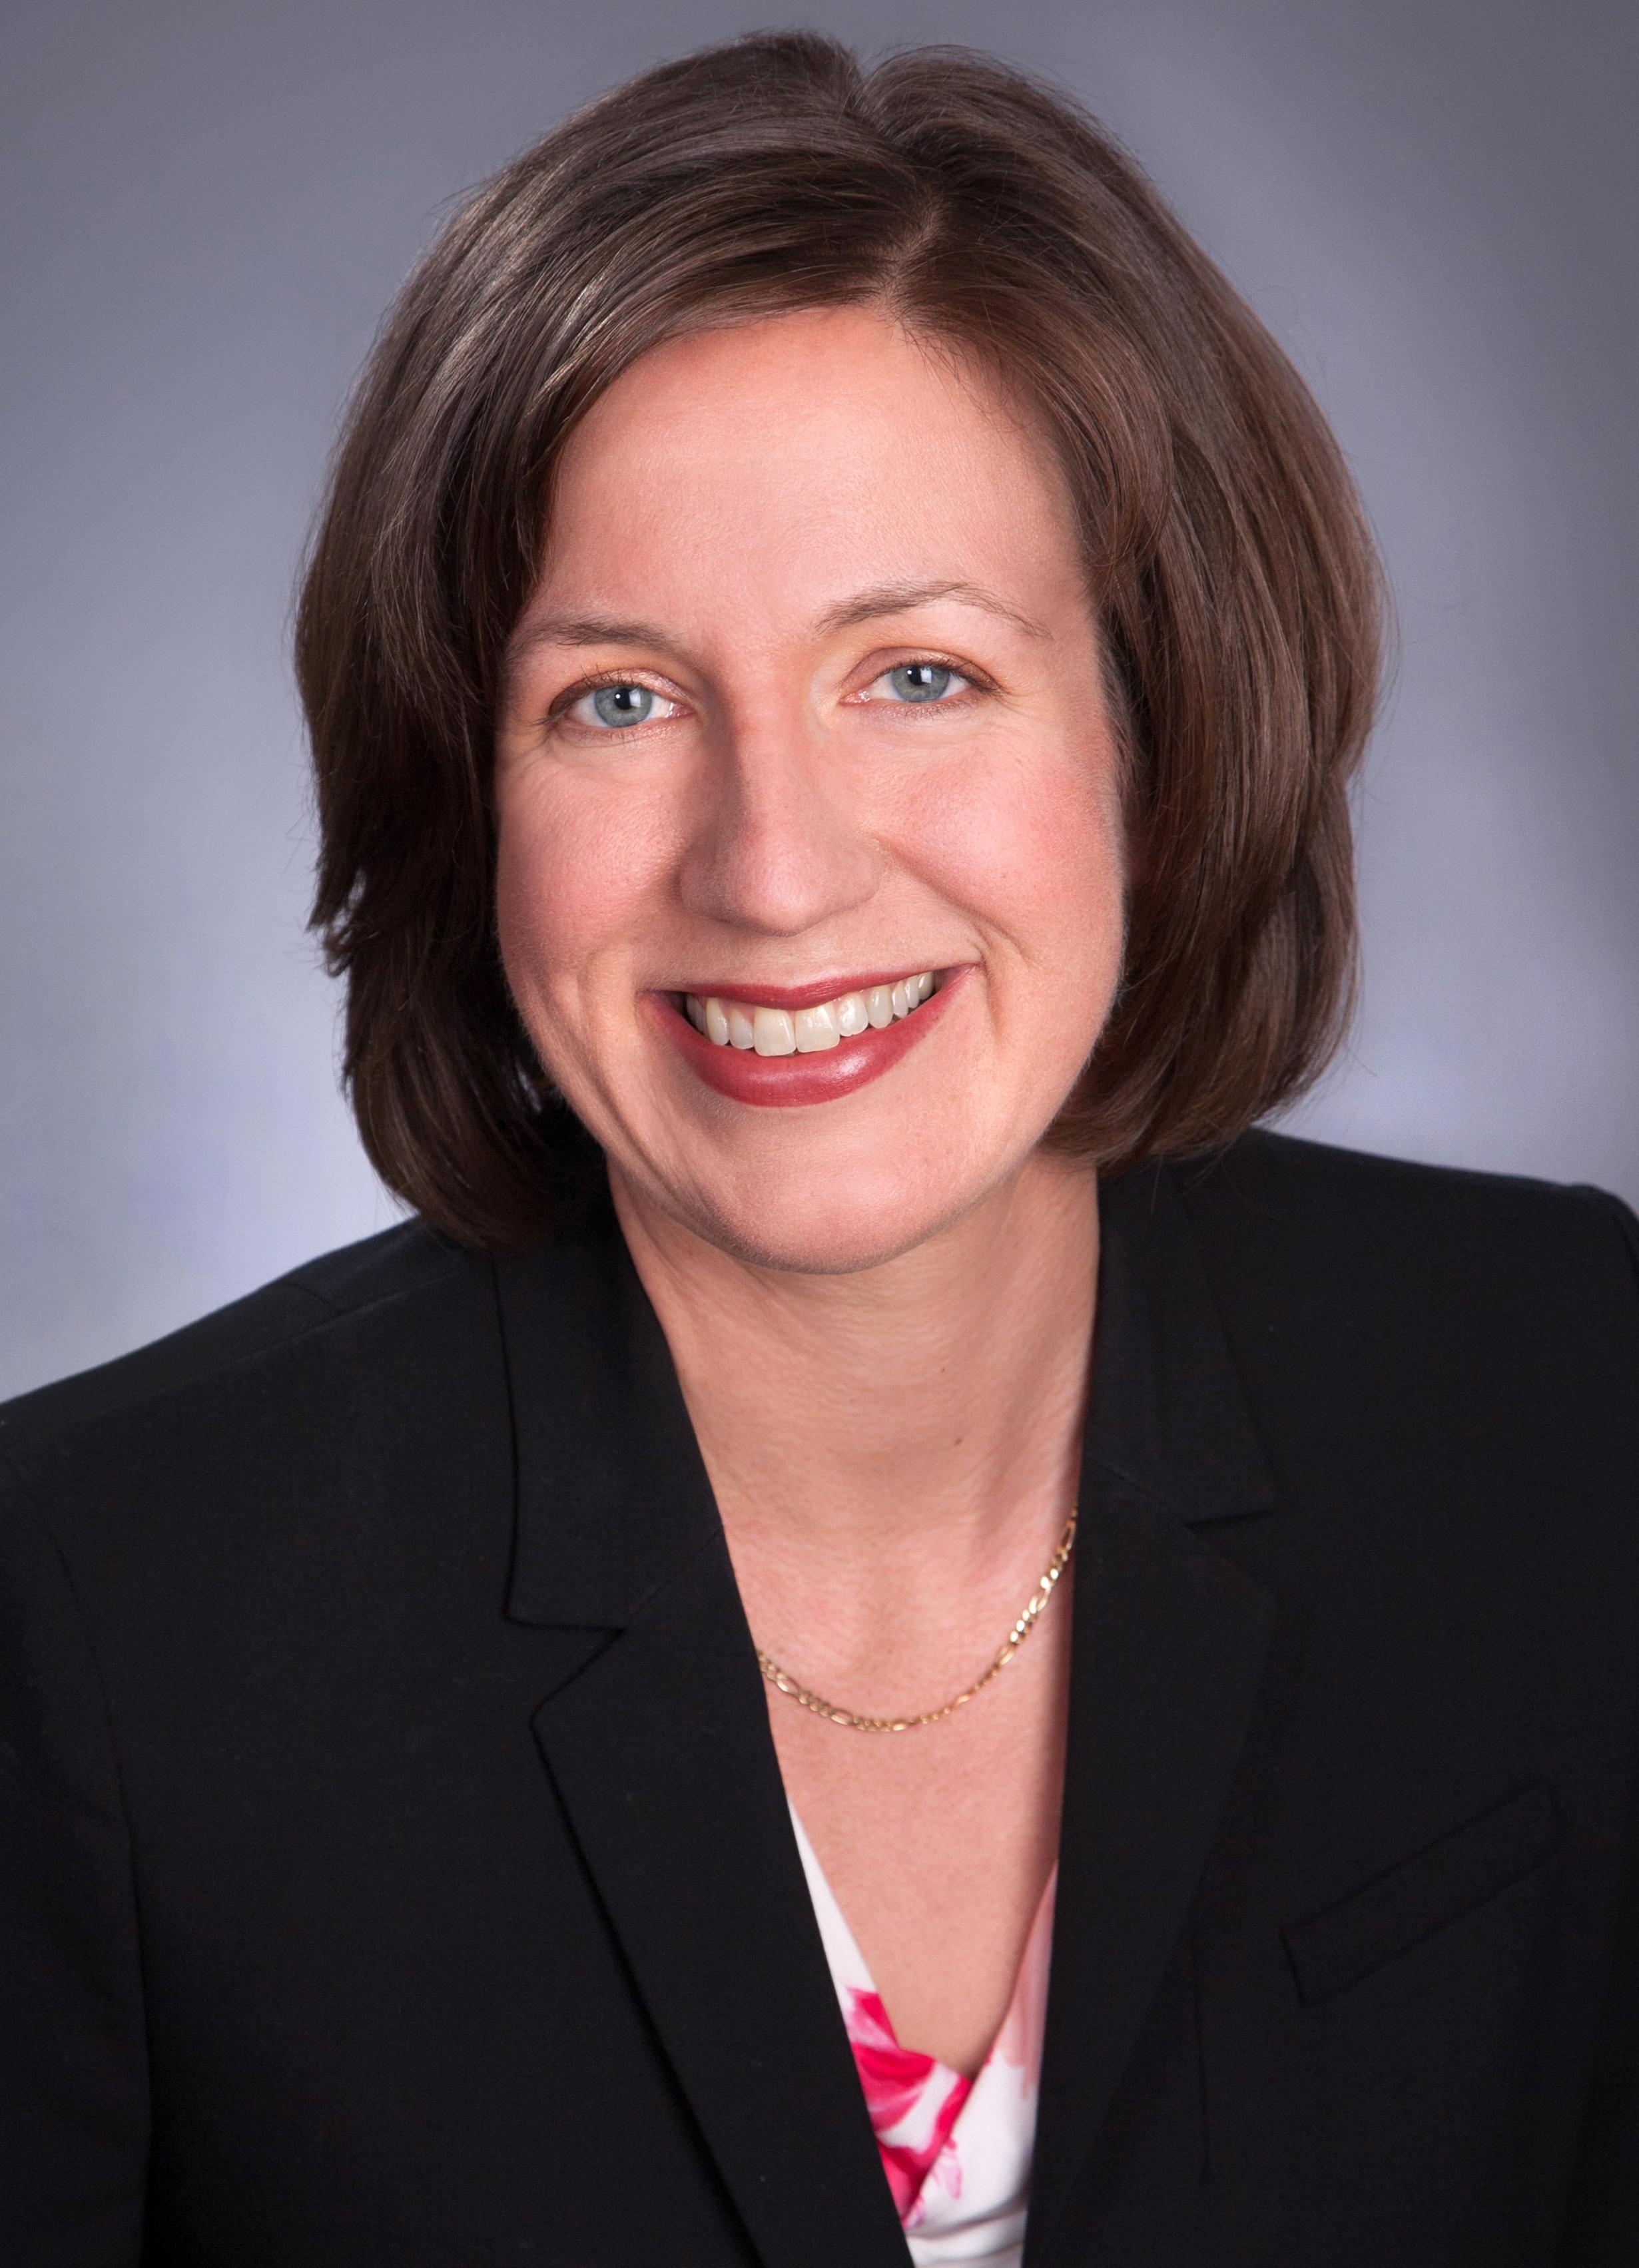 Carrie Hanson Veurink, Managing Partner, Alliance of Career Development Nonprofits